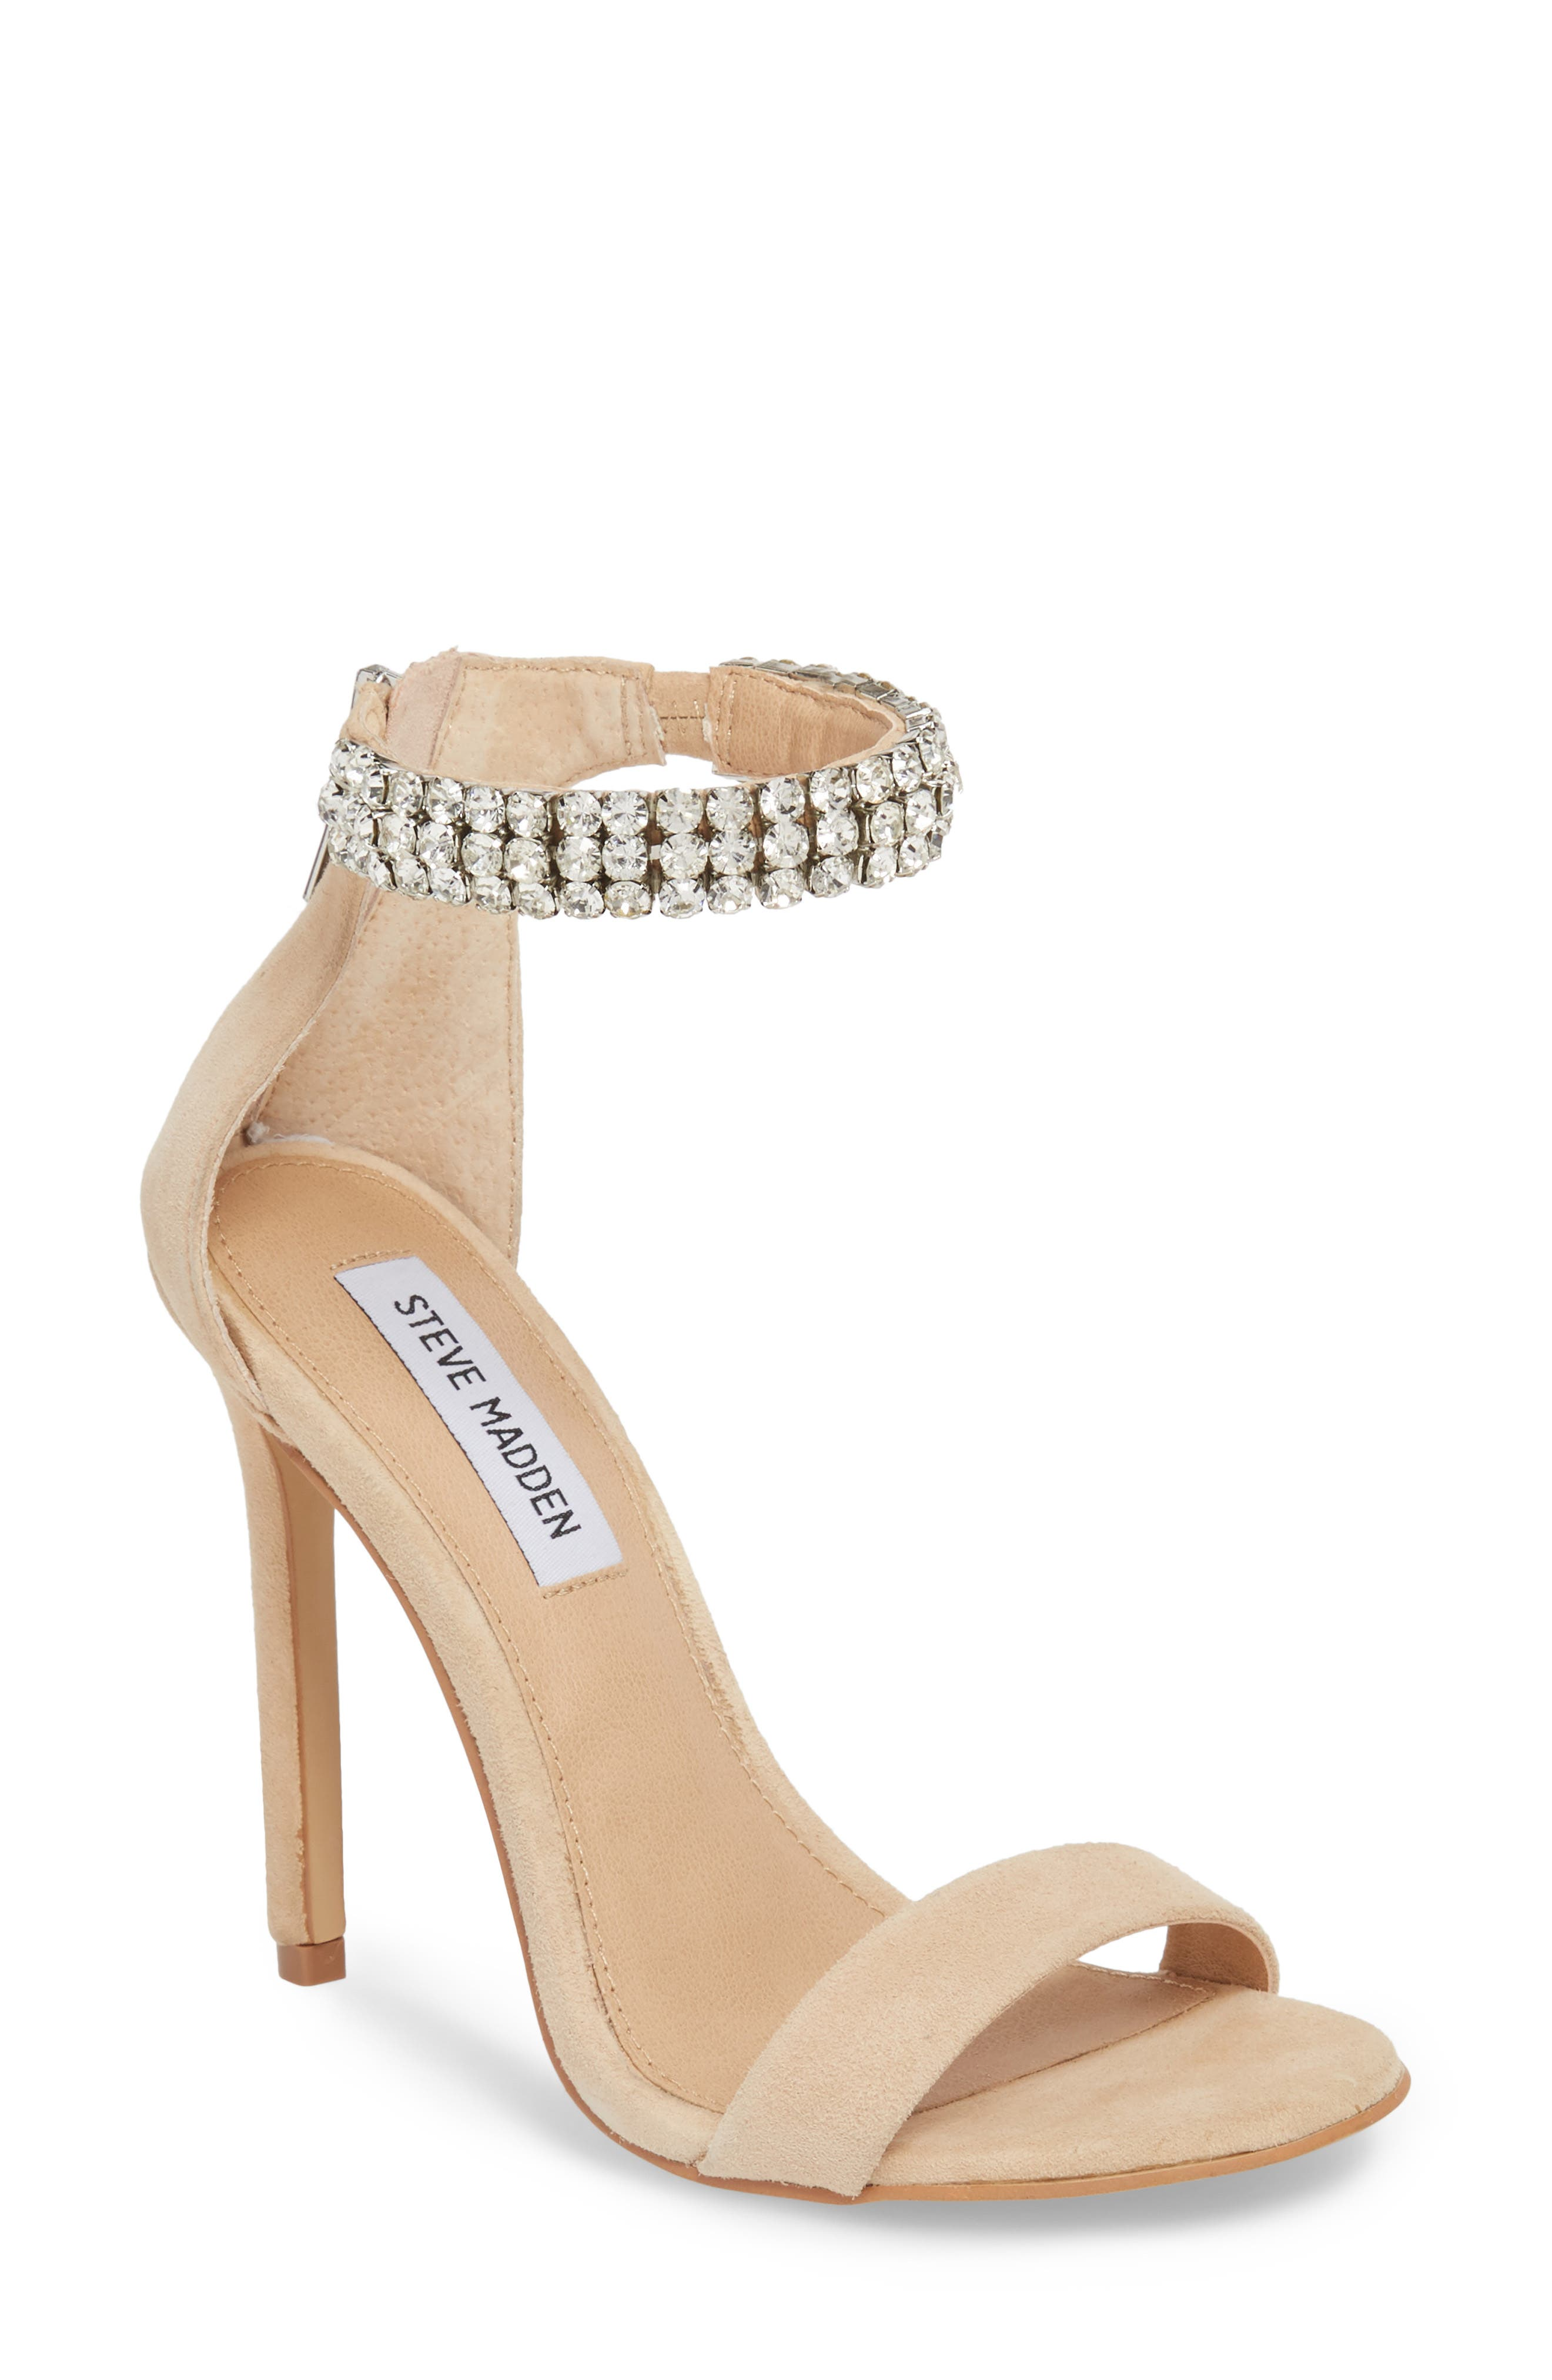 Rando Crystal Sandal,                         Main,                         color, Natural Suede